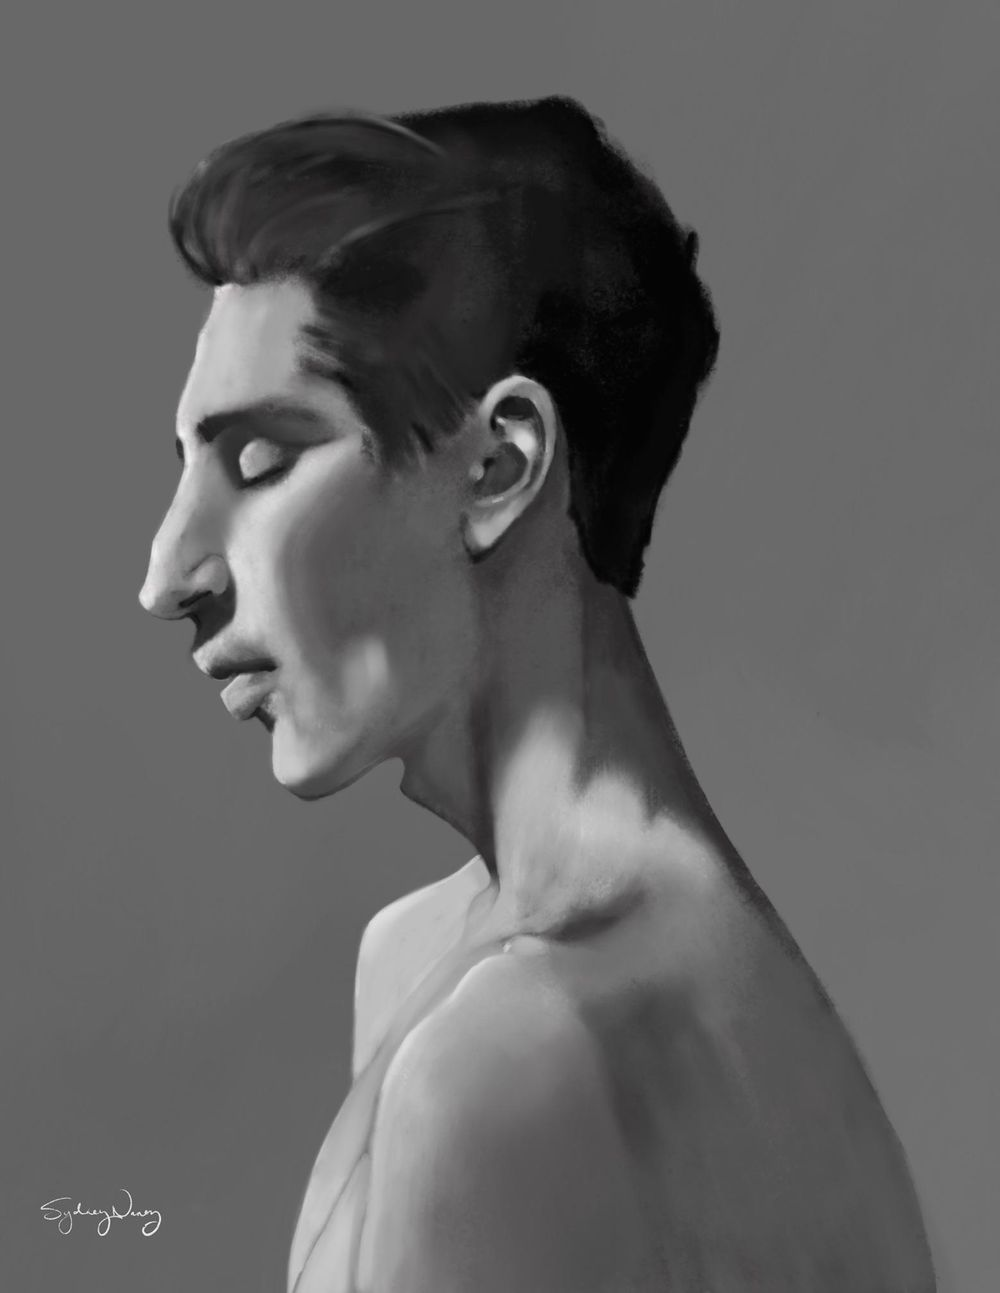 Stylized Portrait - image 1 - student project